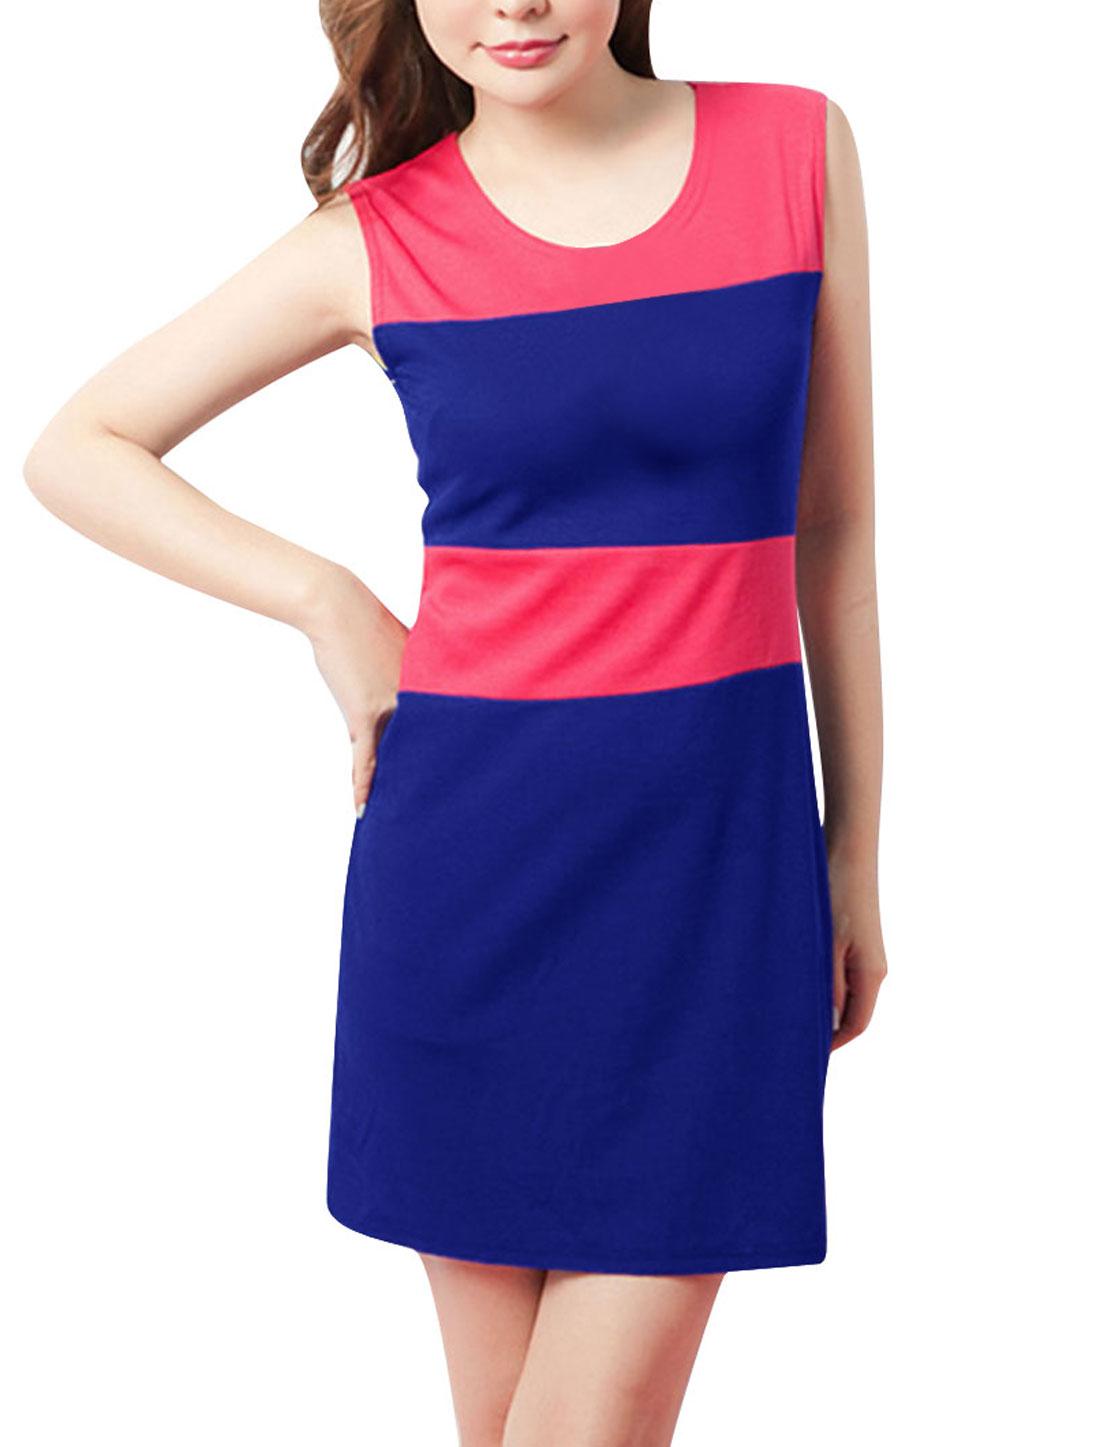 Woman NEW Round Neck Color Blocking Royalblue Fuchsia Casual Mini Dress XS